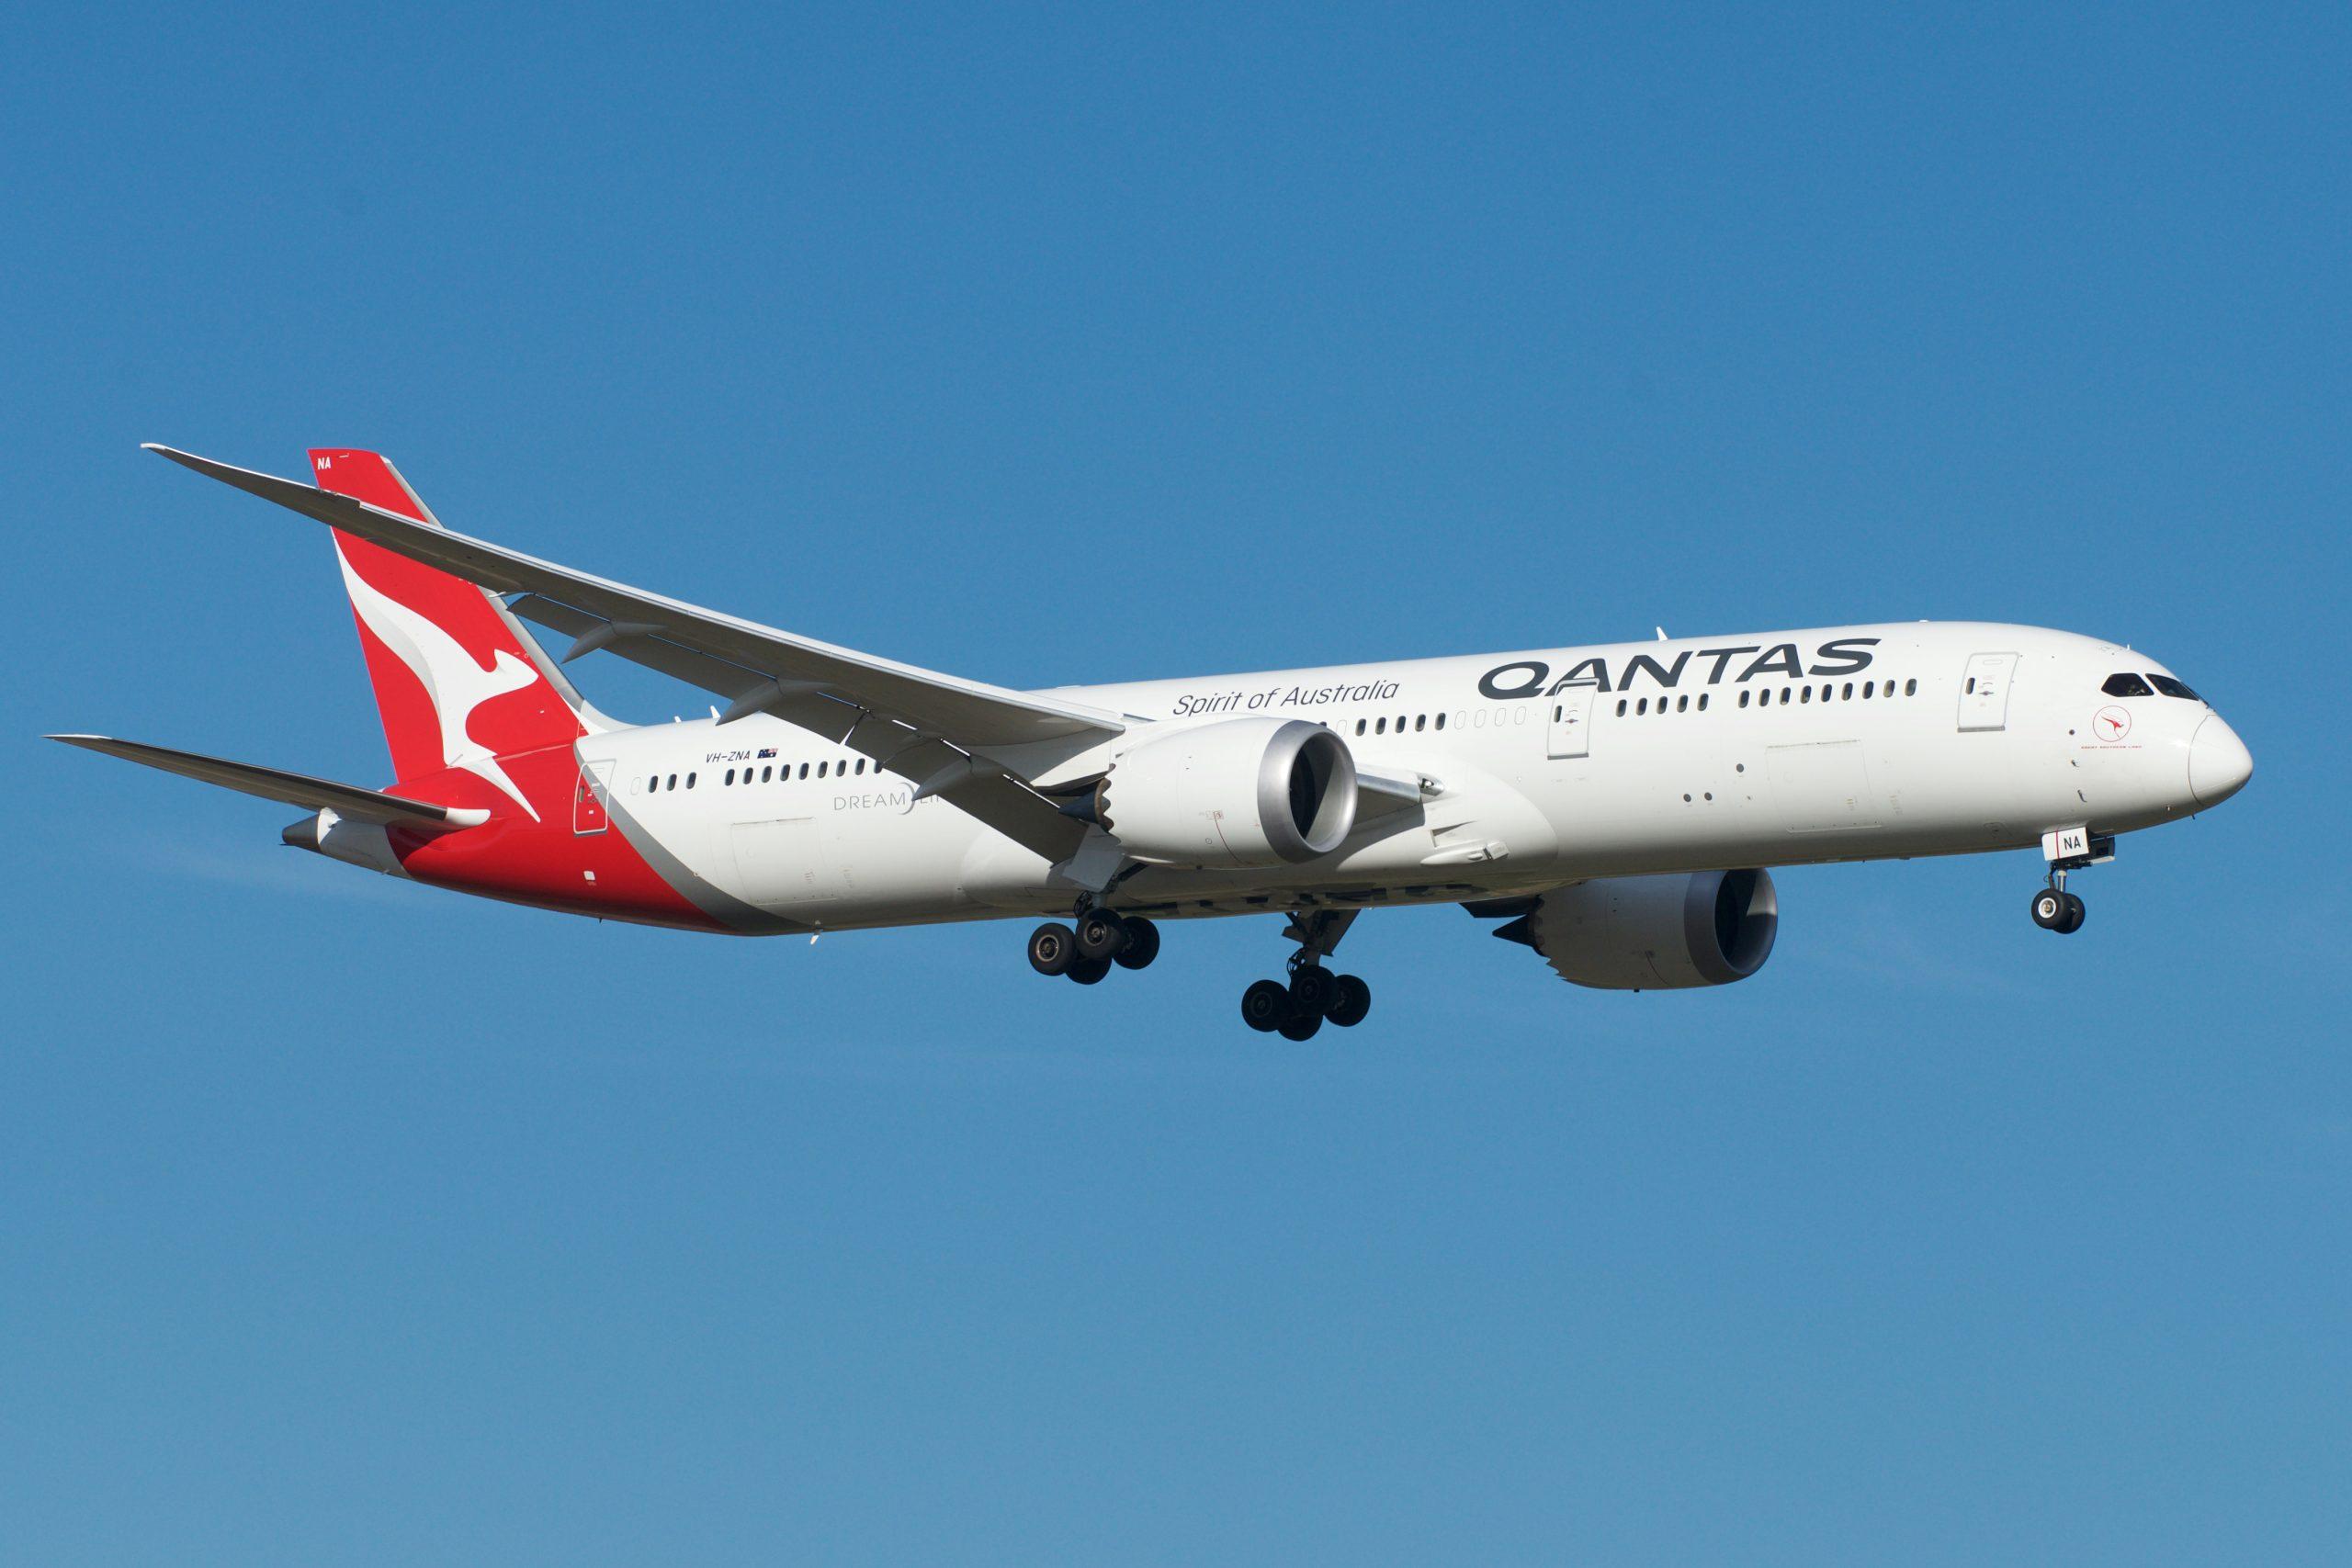 En Boeing 787-9 Dreamliner fra Qantas. Foto: BriYYZ, CC 2.0